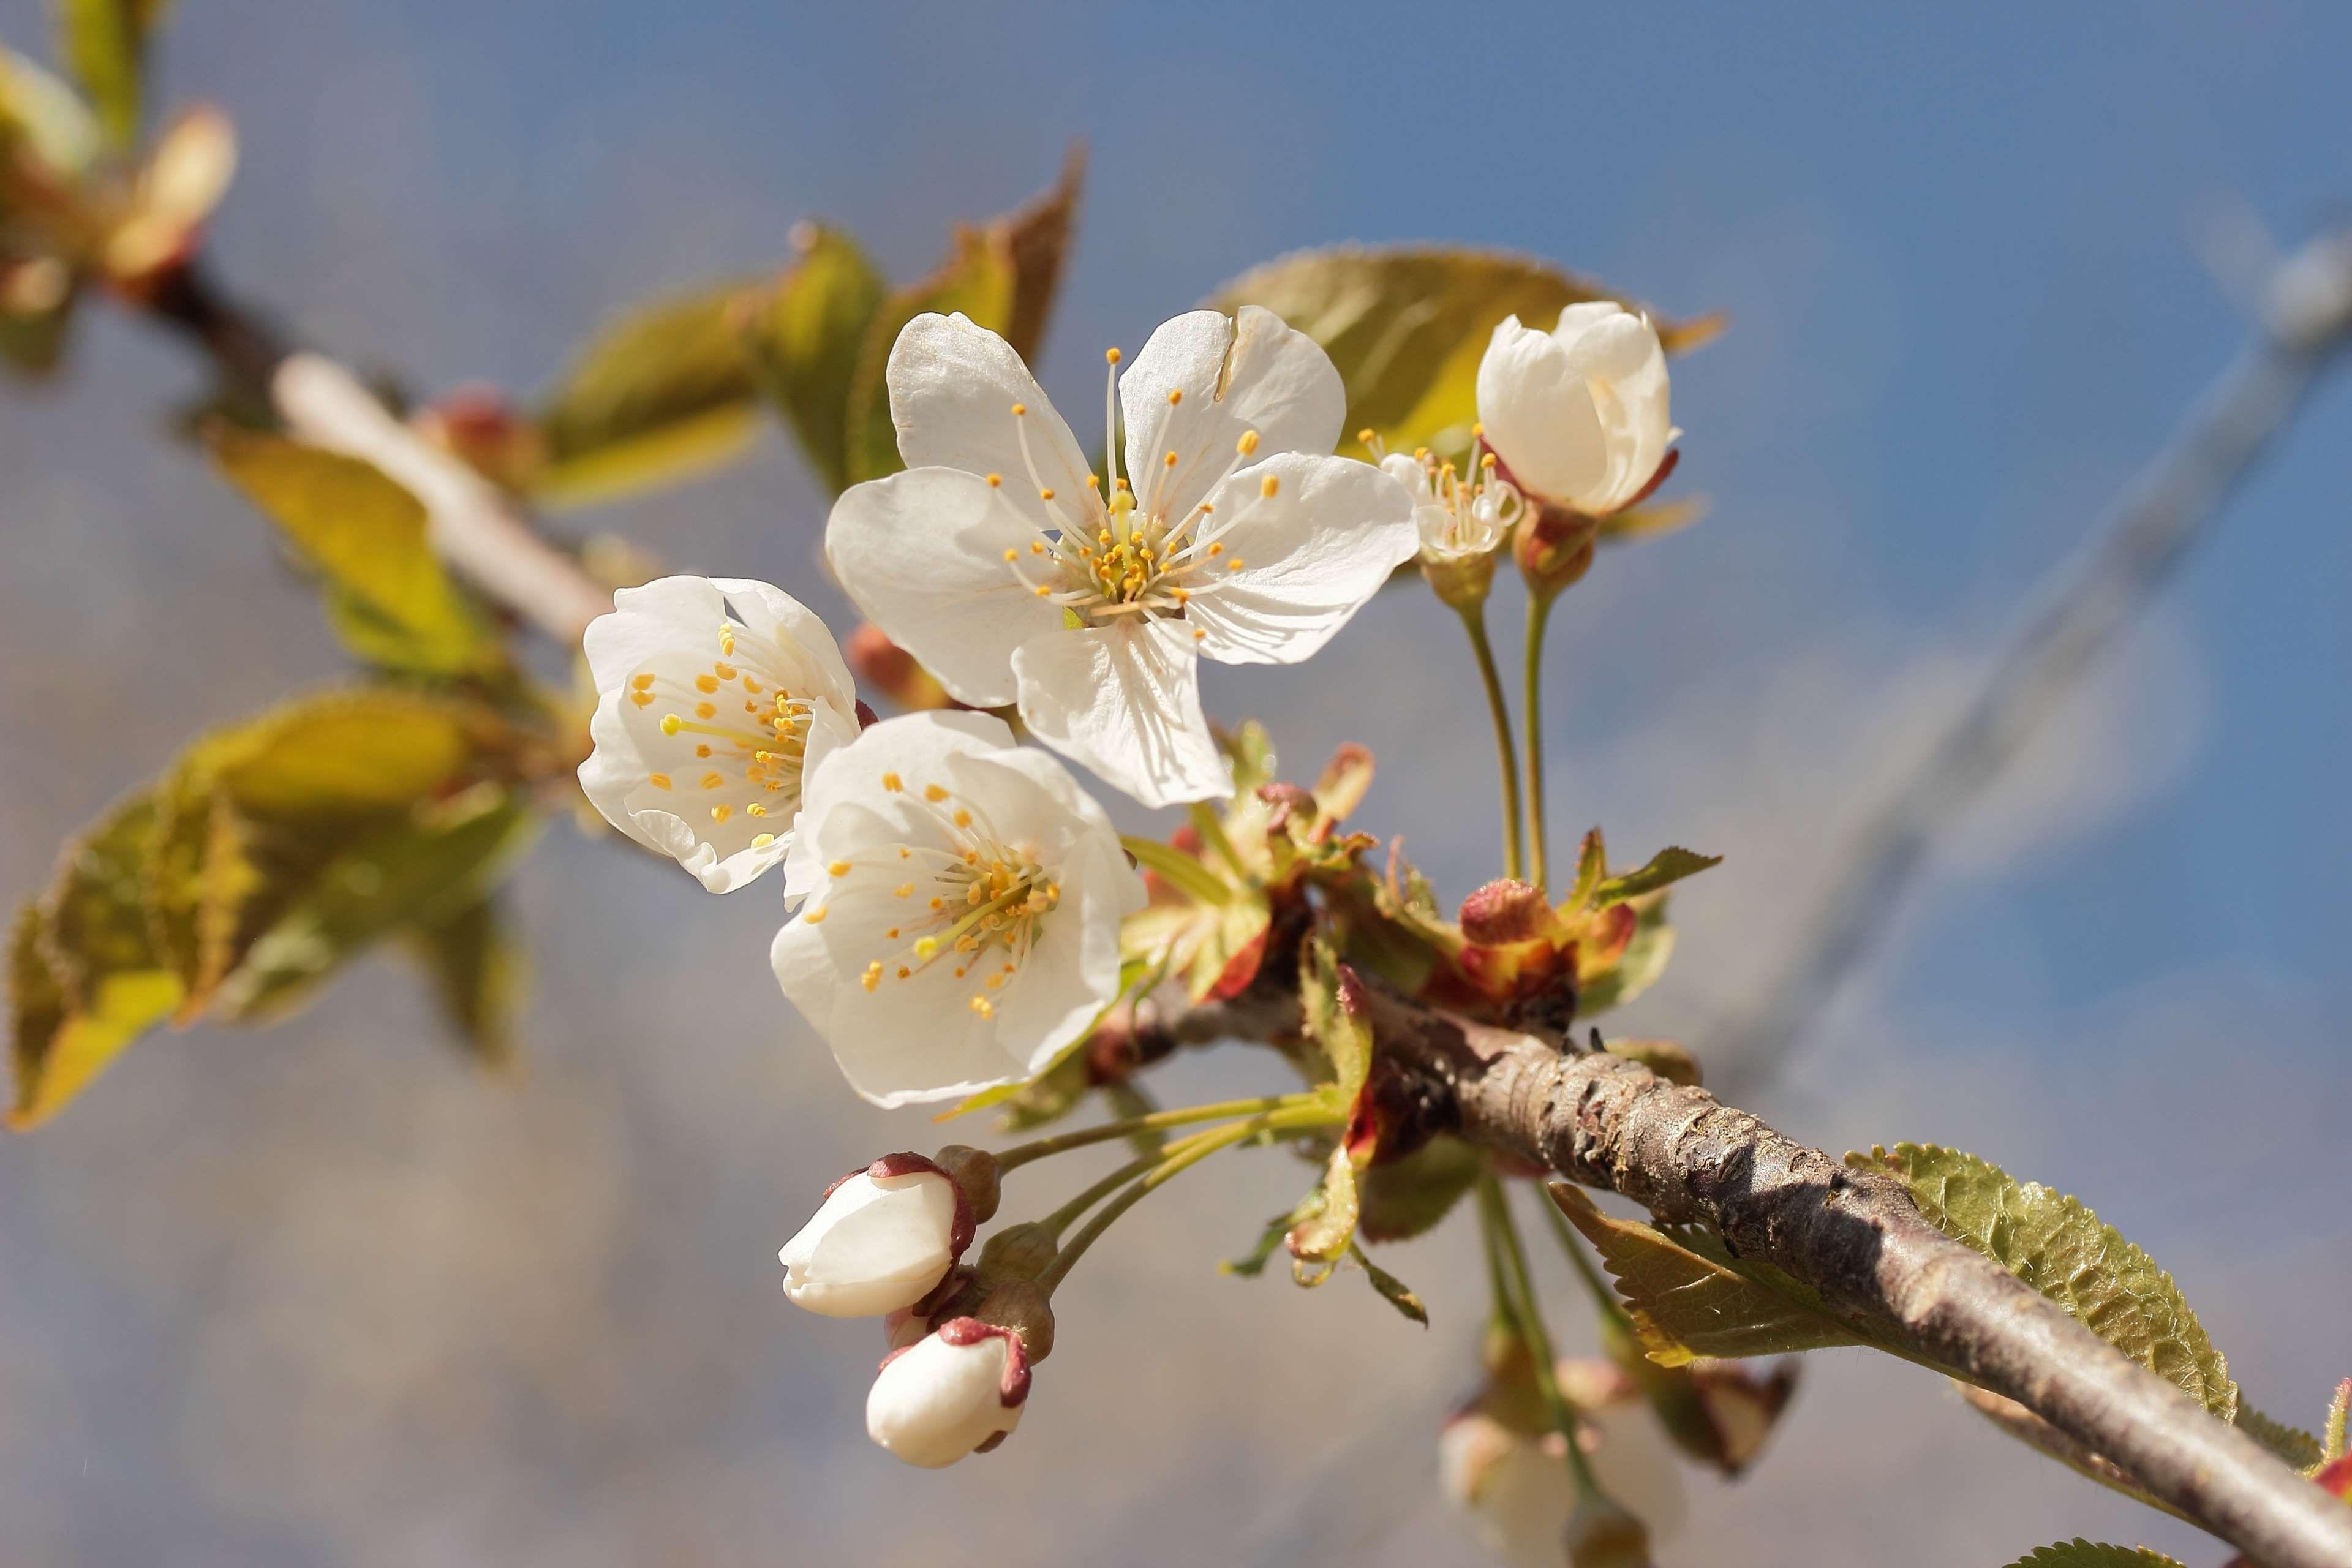 apple blossom, bloom, blossom, fruit tree, nature, spring